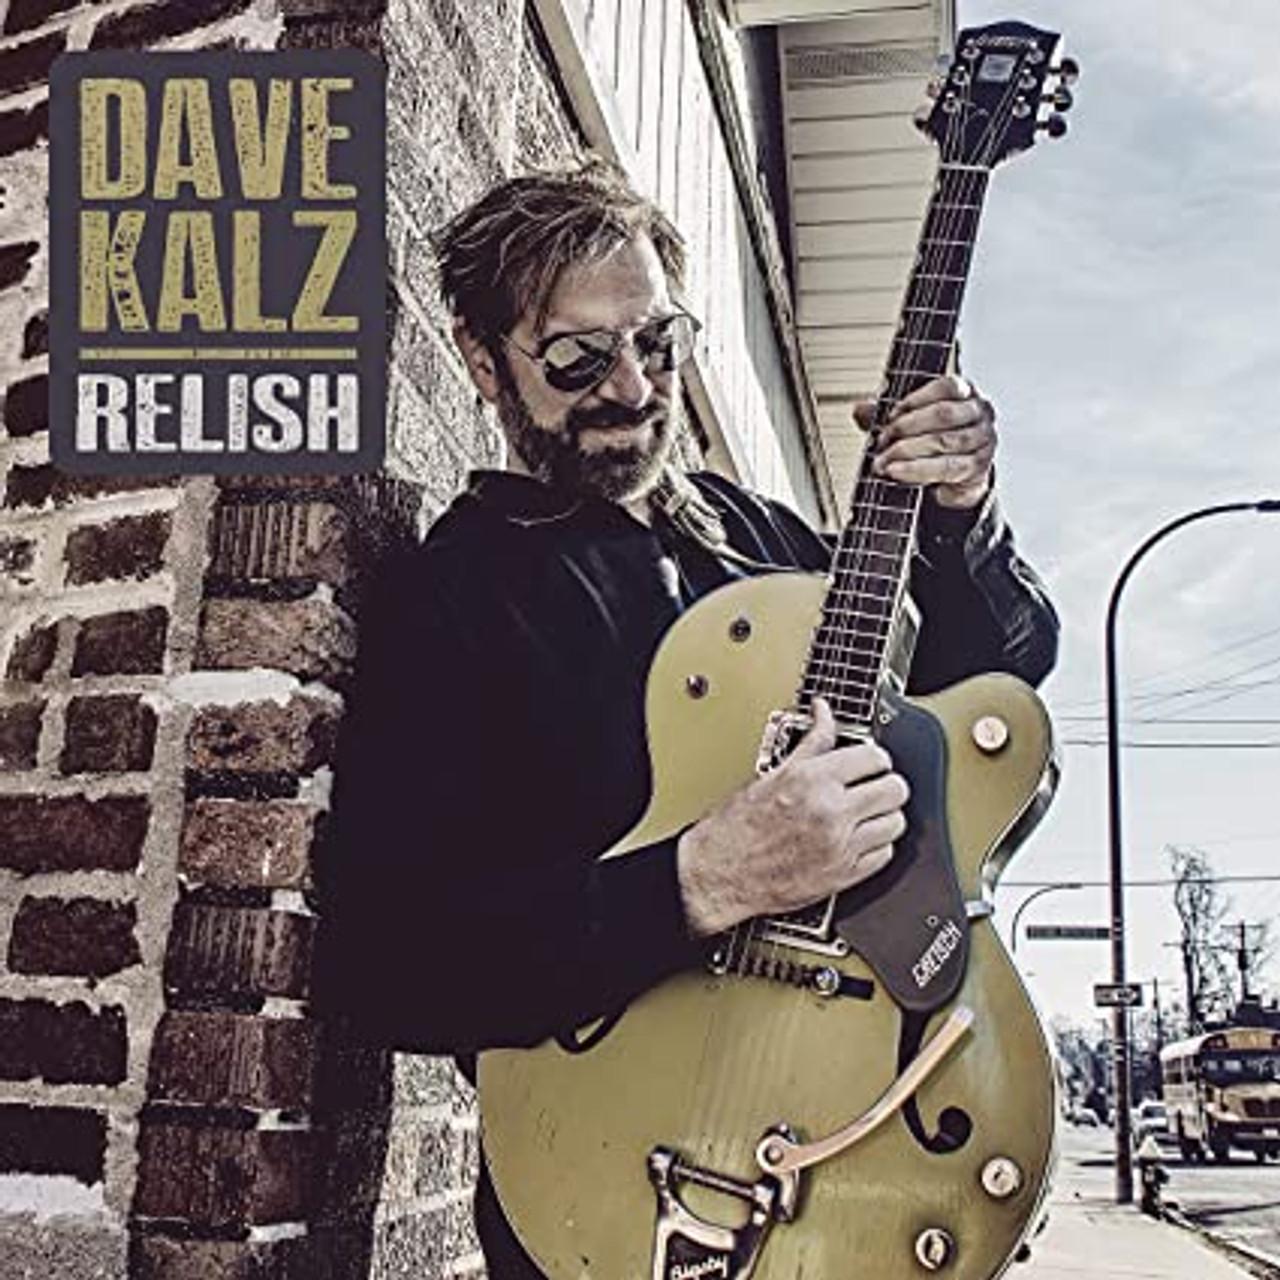 DAVE KALZ - RELISH